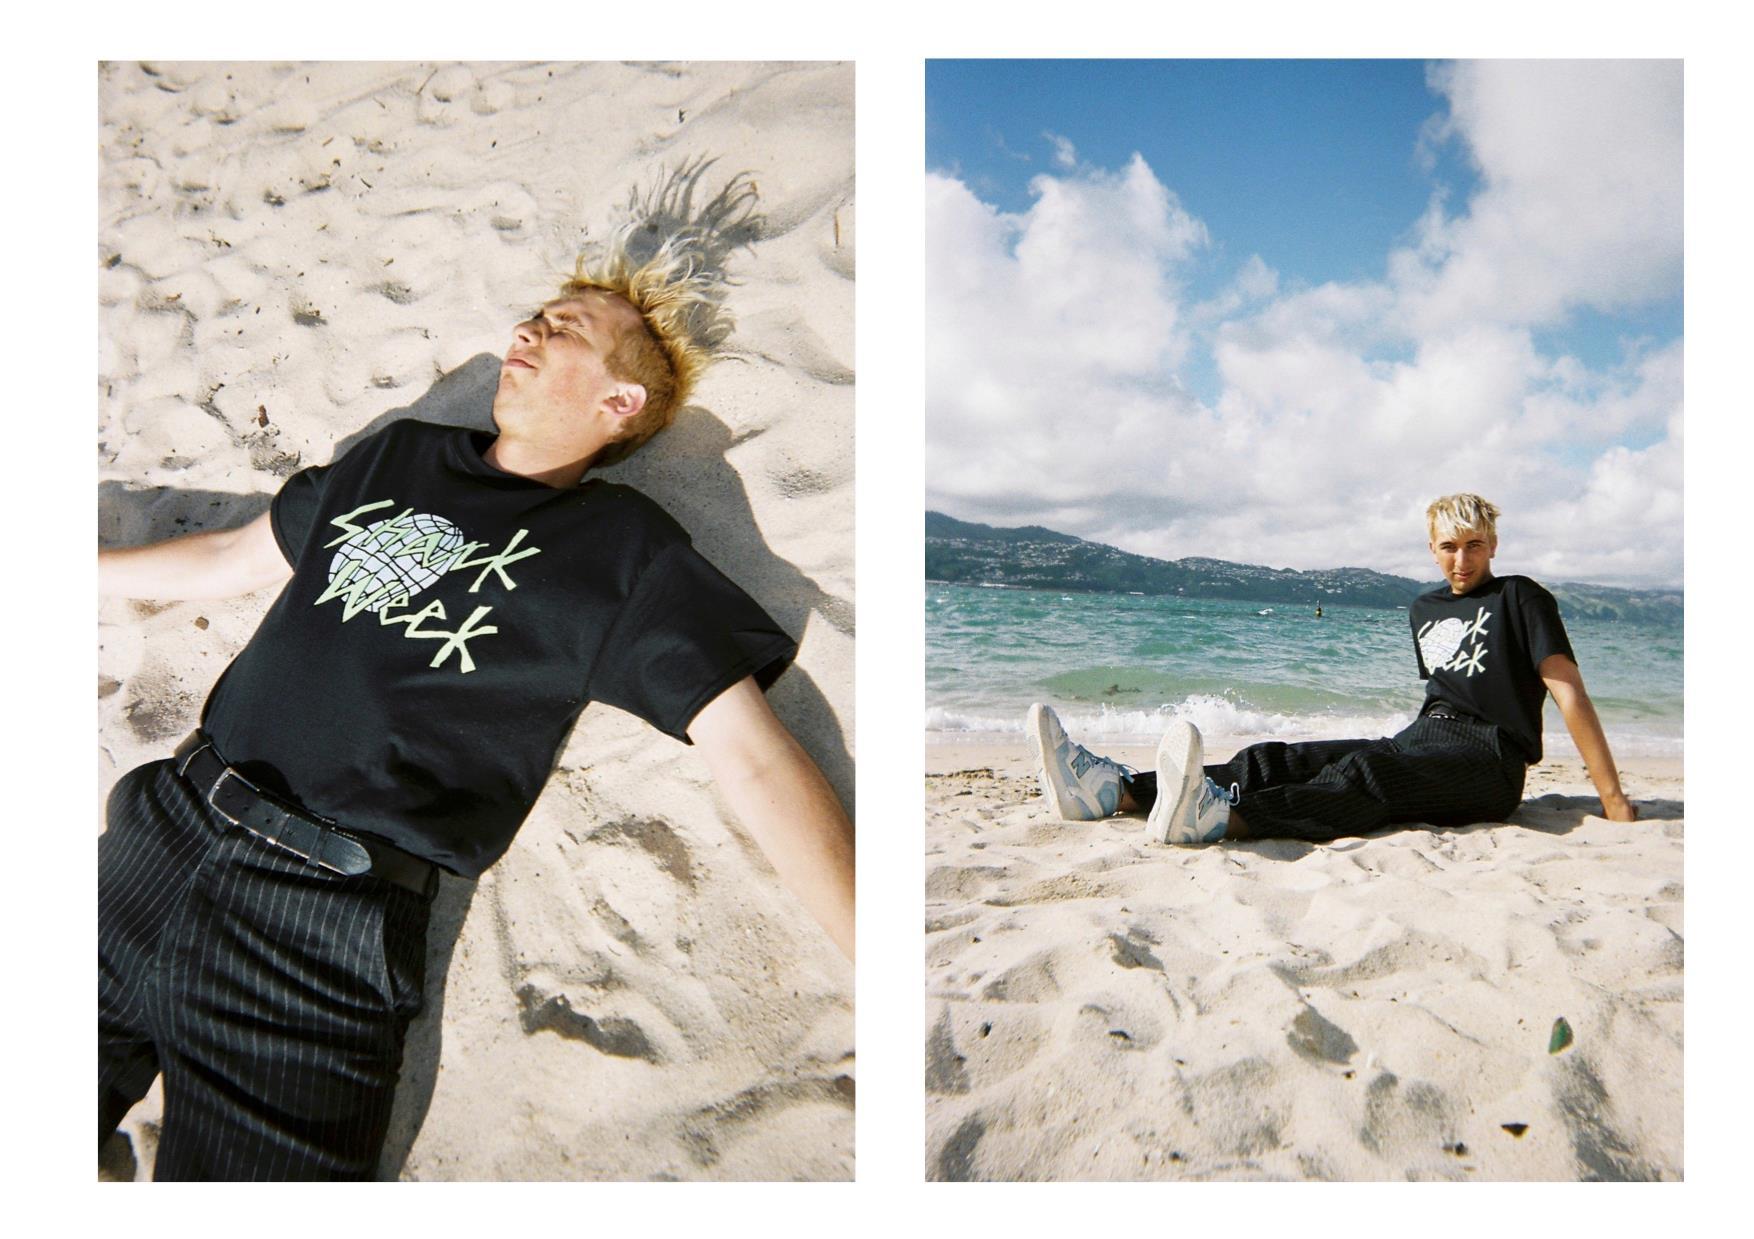 Above: Beach Boy in Shark Week's summer campaign